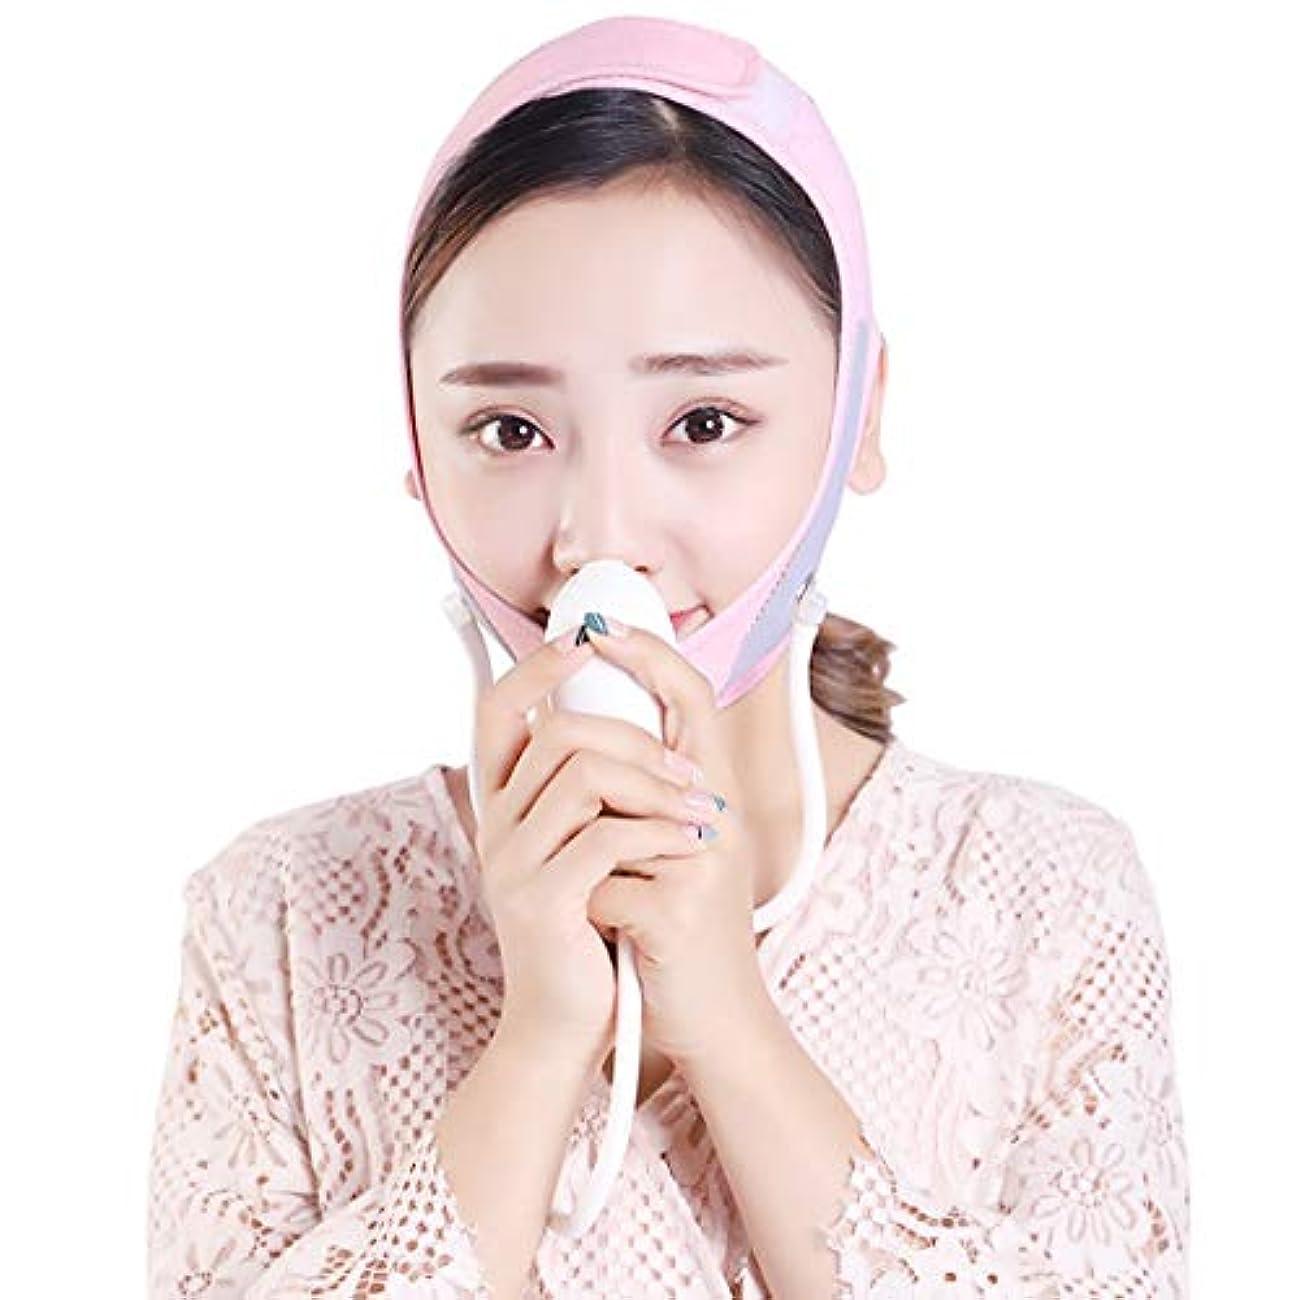 ZWBD フェイスマスク, 薄いフェイス包帯インフレータブル調節可能なフェイスリフトアーチファクト包帯をダブルチンリフト引き締めシワ小さなv顔男性と女性